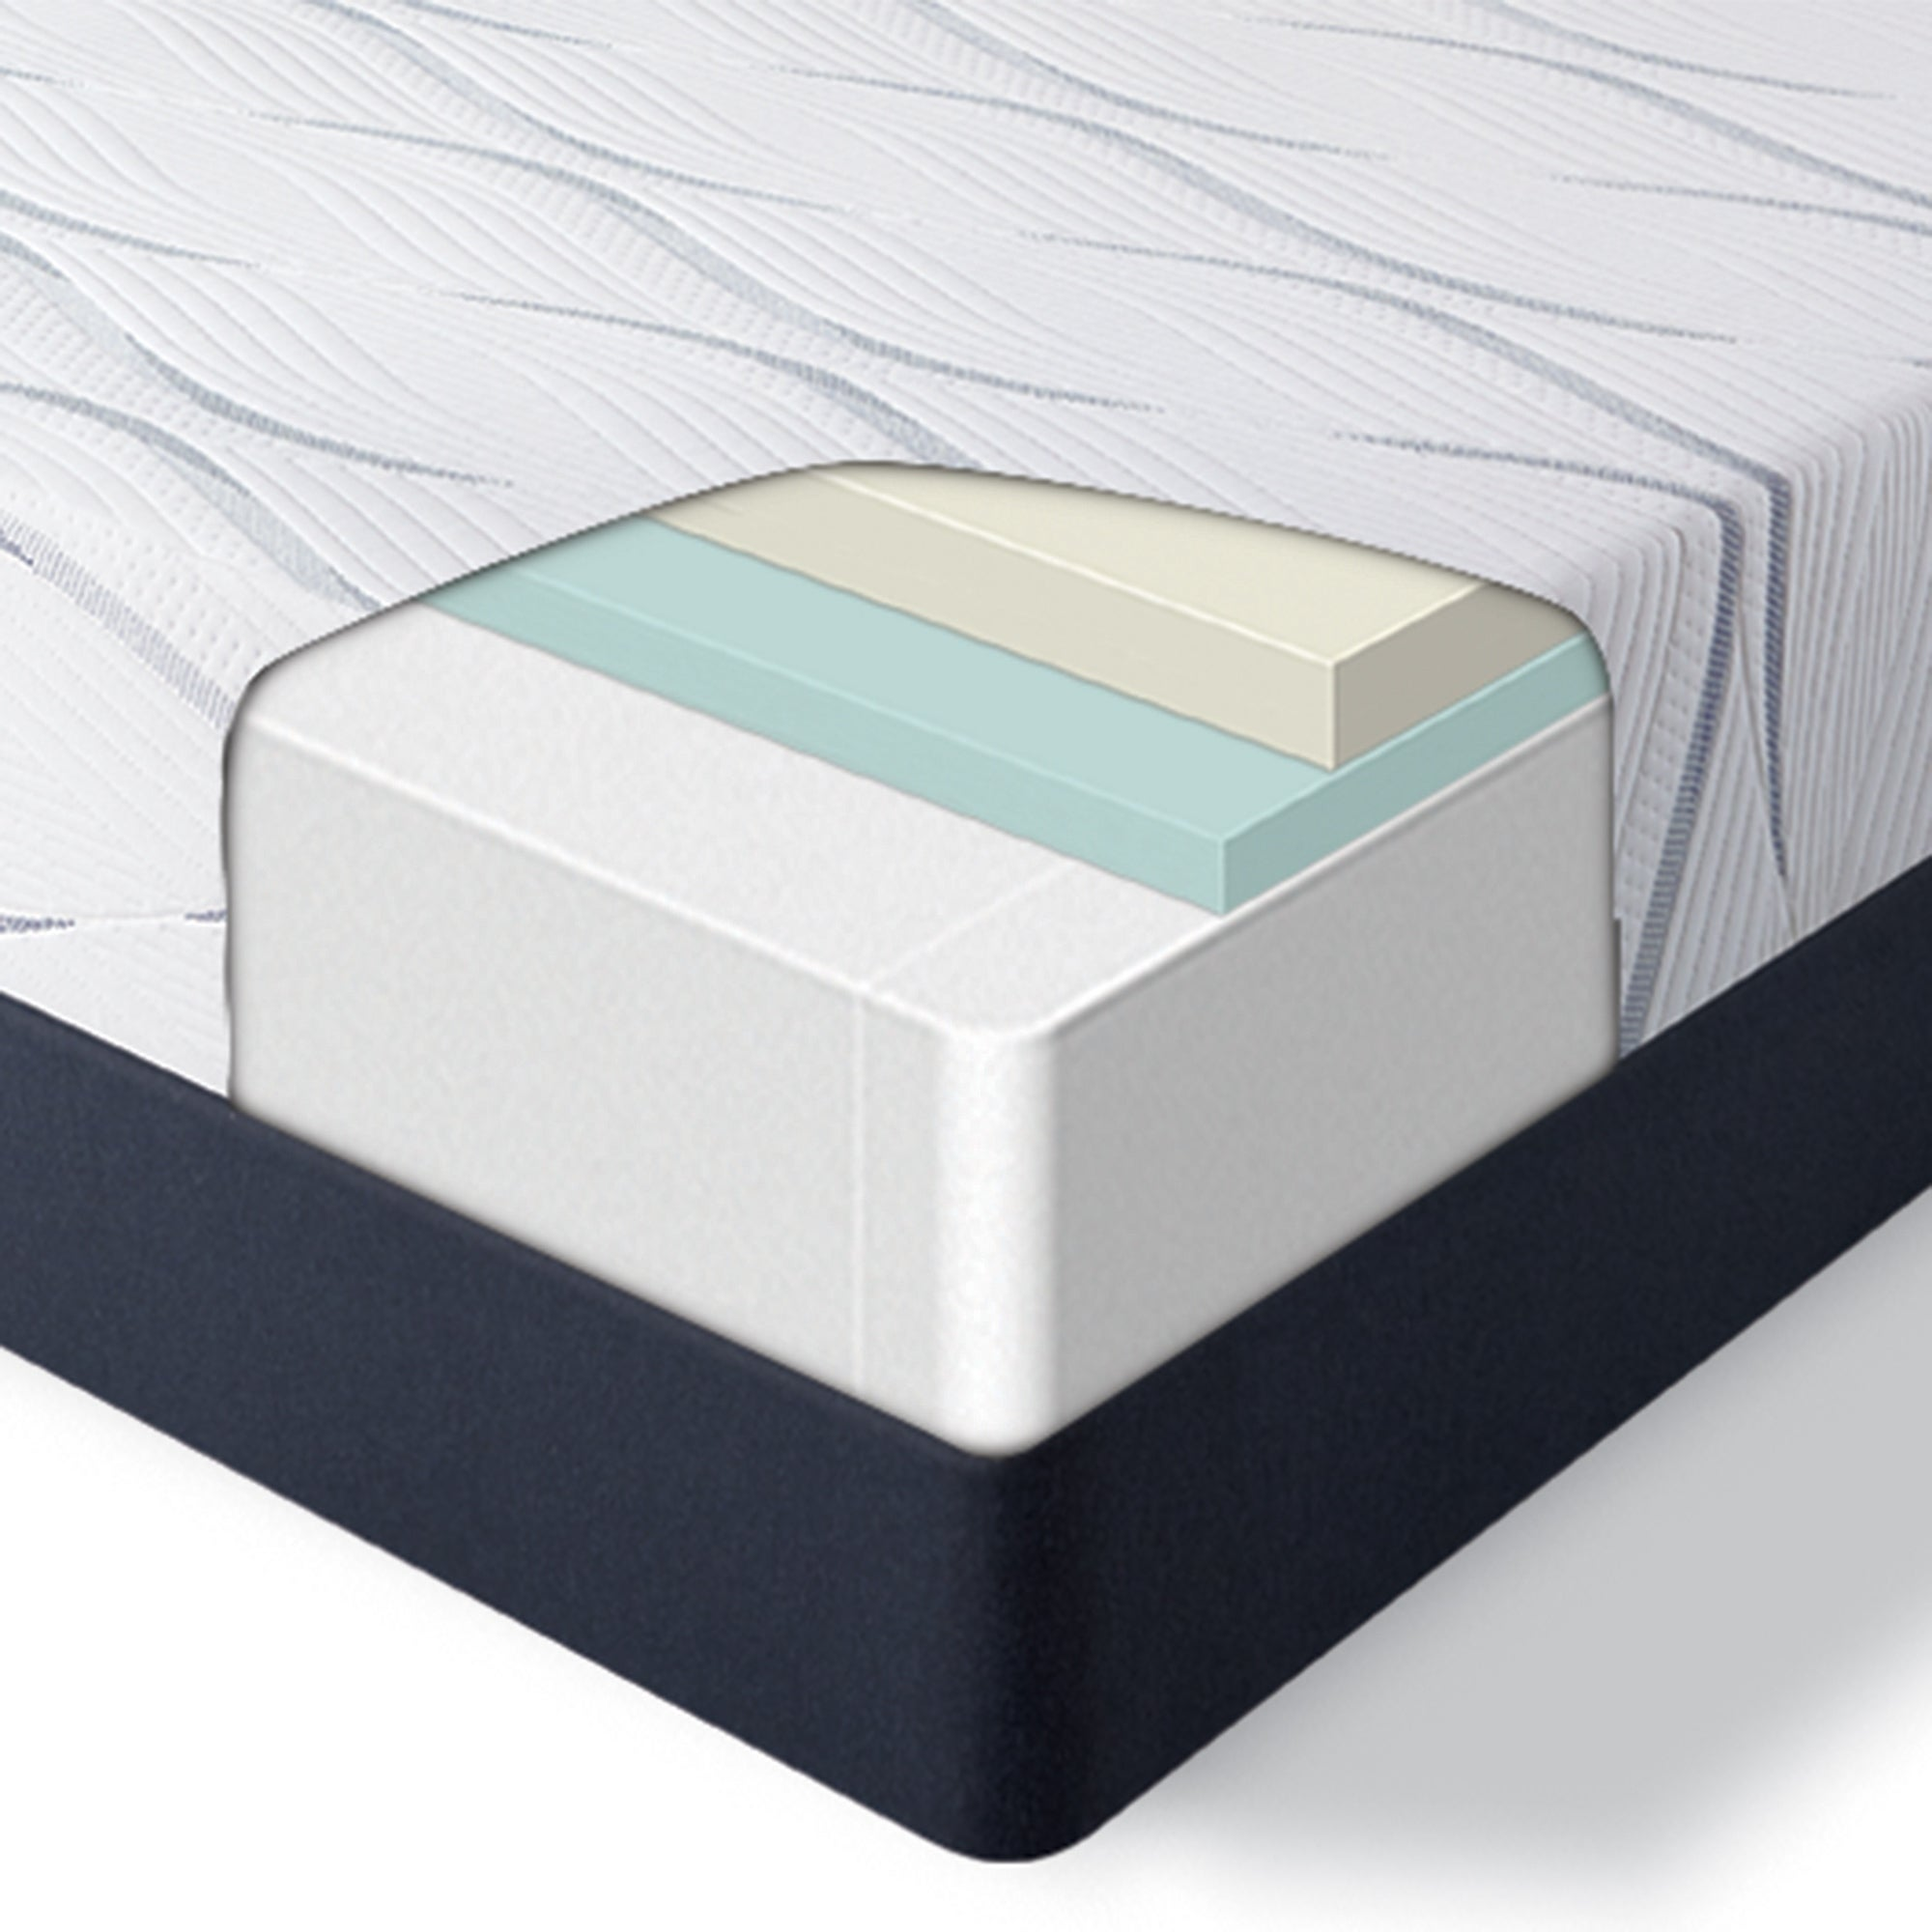 Serta Perfect Sleeper 12 Inch Southpoint Ii Medium Foam Mattress Overstock 28082034